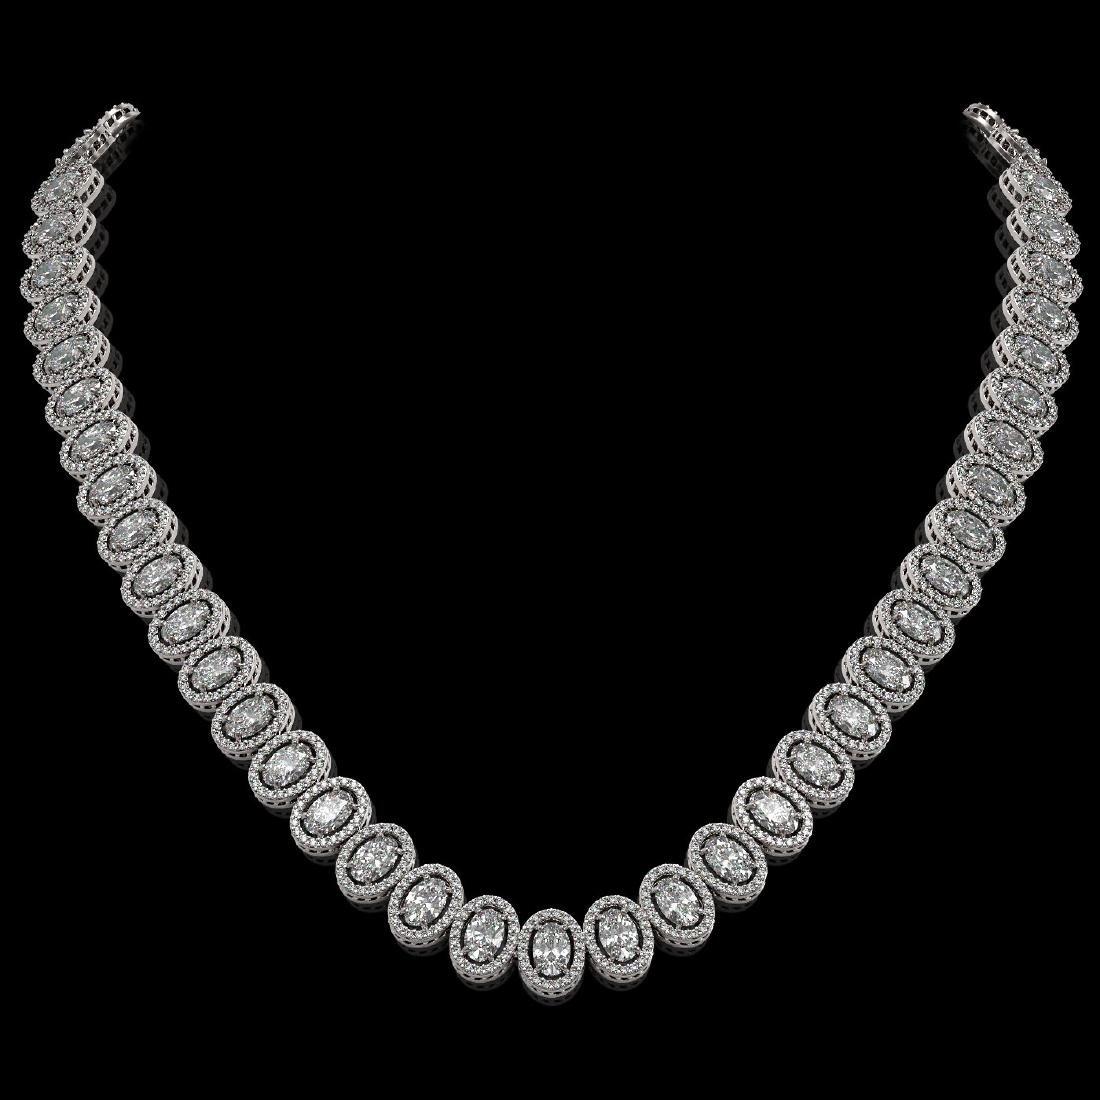 34.72 CTW Oval Diamond Designer Necklace 18K White Gold